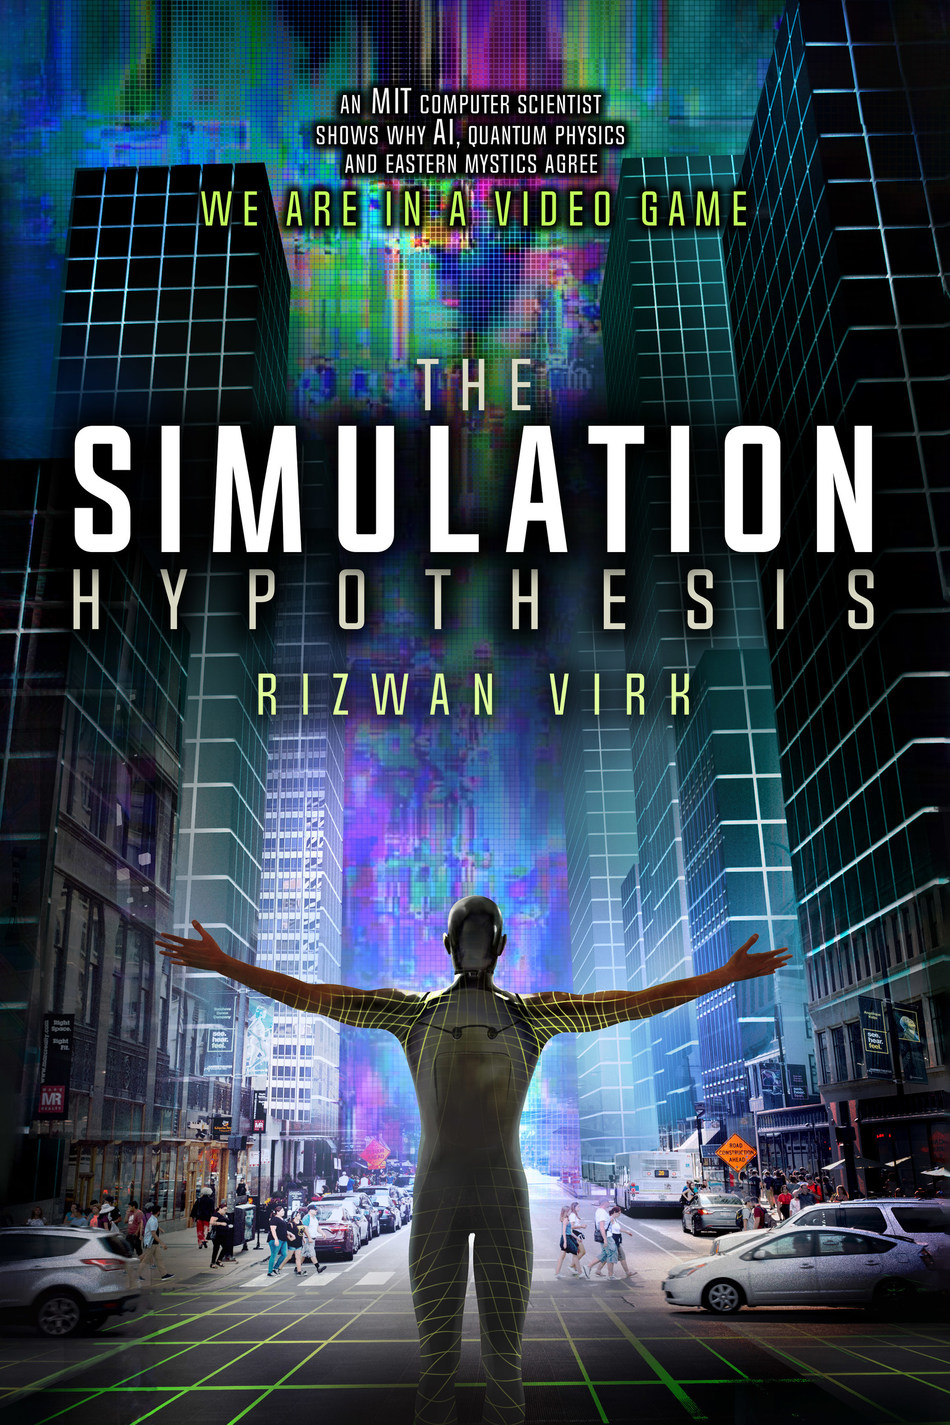 The Simulation Hypothesis: όταν το Matrix γίνεται πραγματικότητα